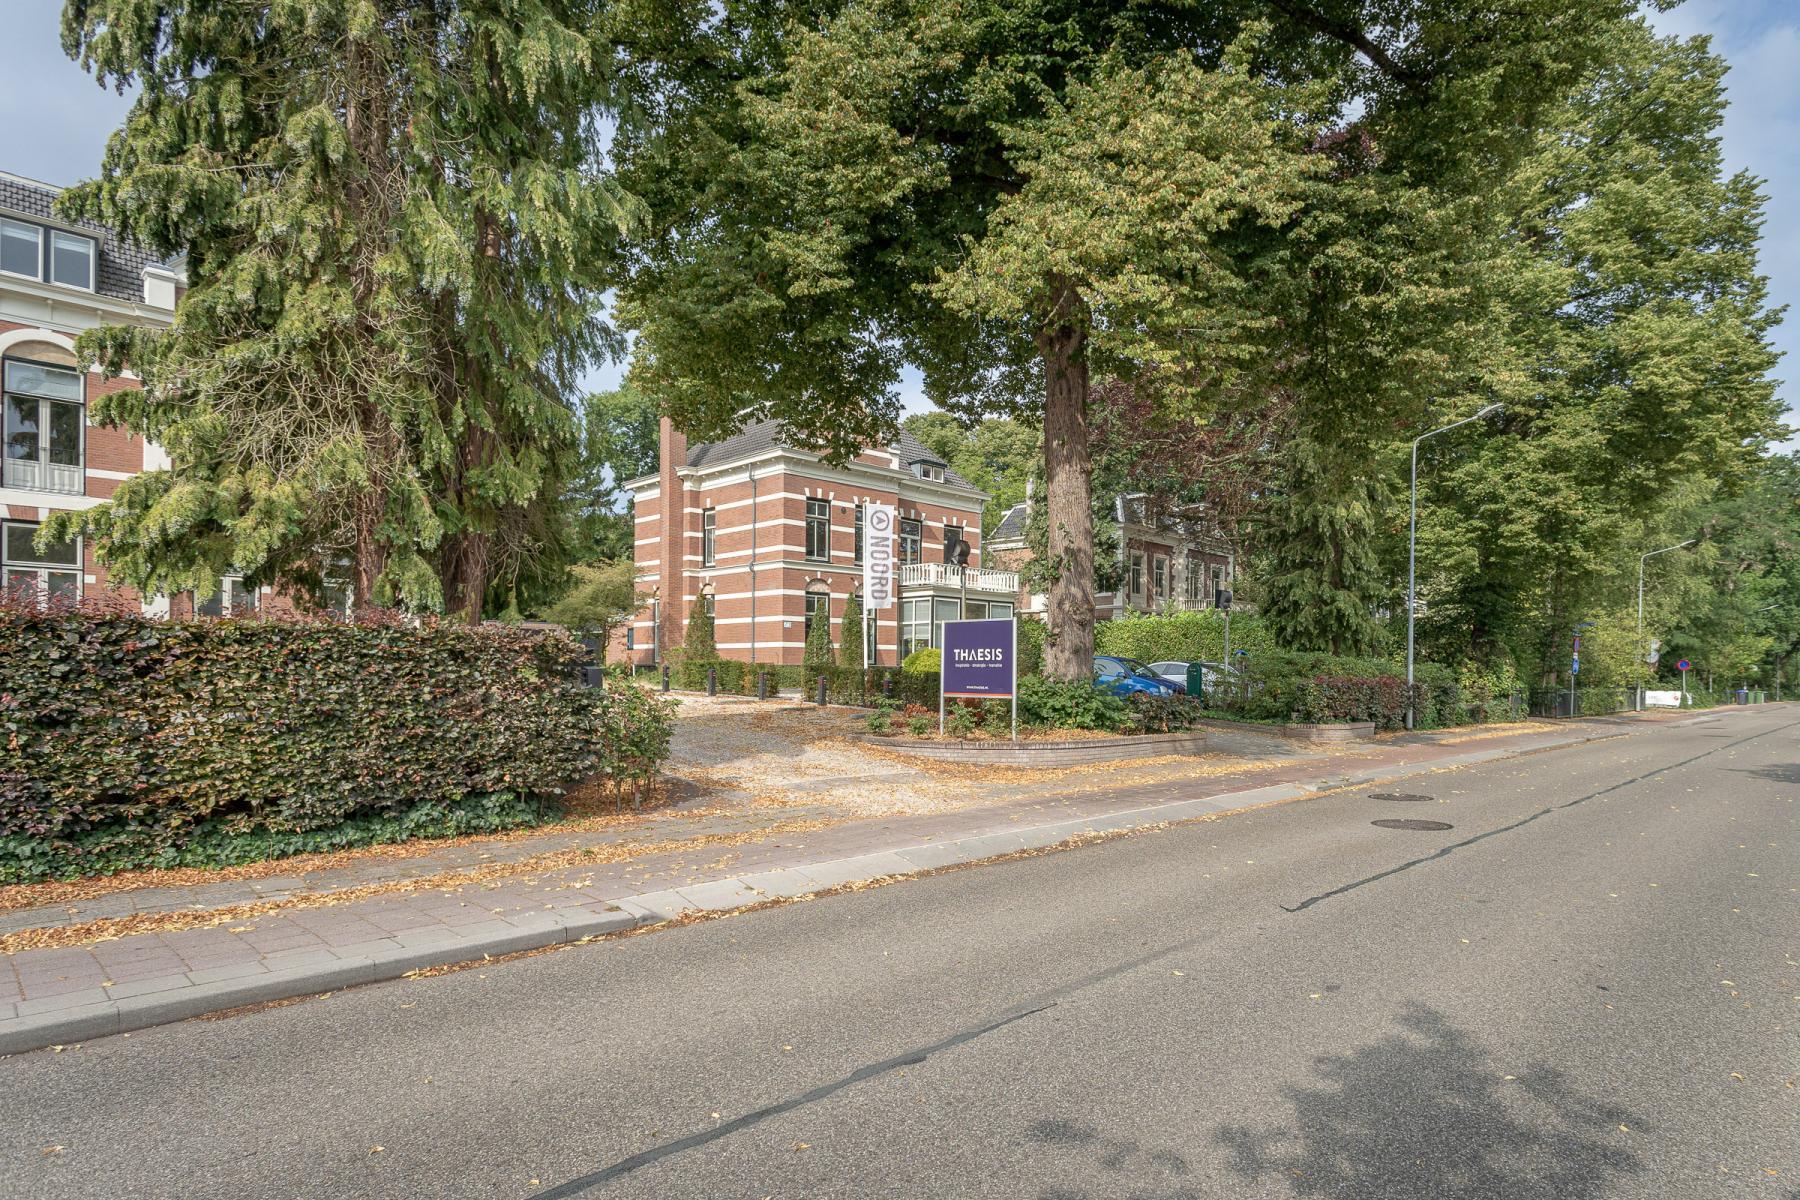 Kantoorruimte huren  's-Gravelandseweg 73, Hilversum (9)